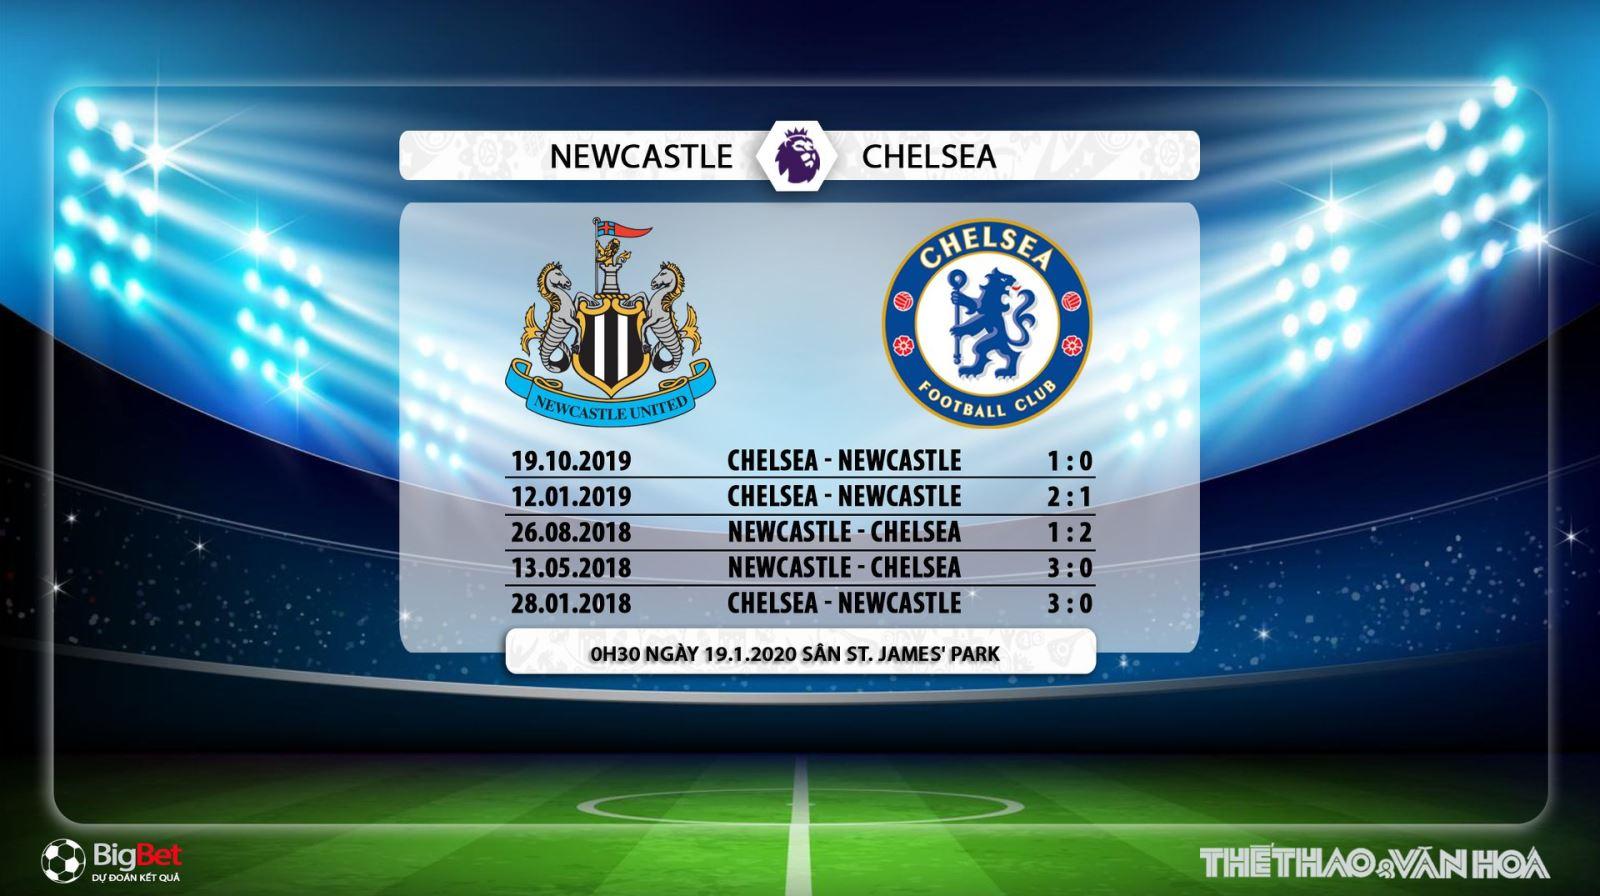 Newcastle vs Chelsea, dự đoán Newcastle vs Chelsea, chelsea, newcastle, trực tiếp Newcastle vs Chelsea, nhận định Newcastle vs Chelsea, soi kèo Newcastle vs Chelsea